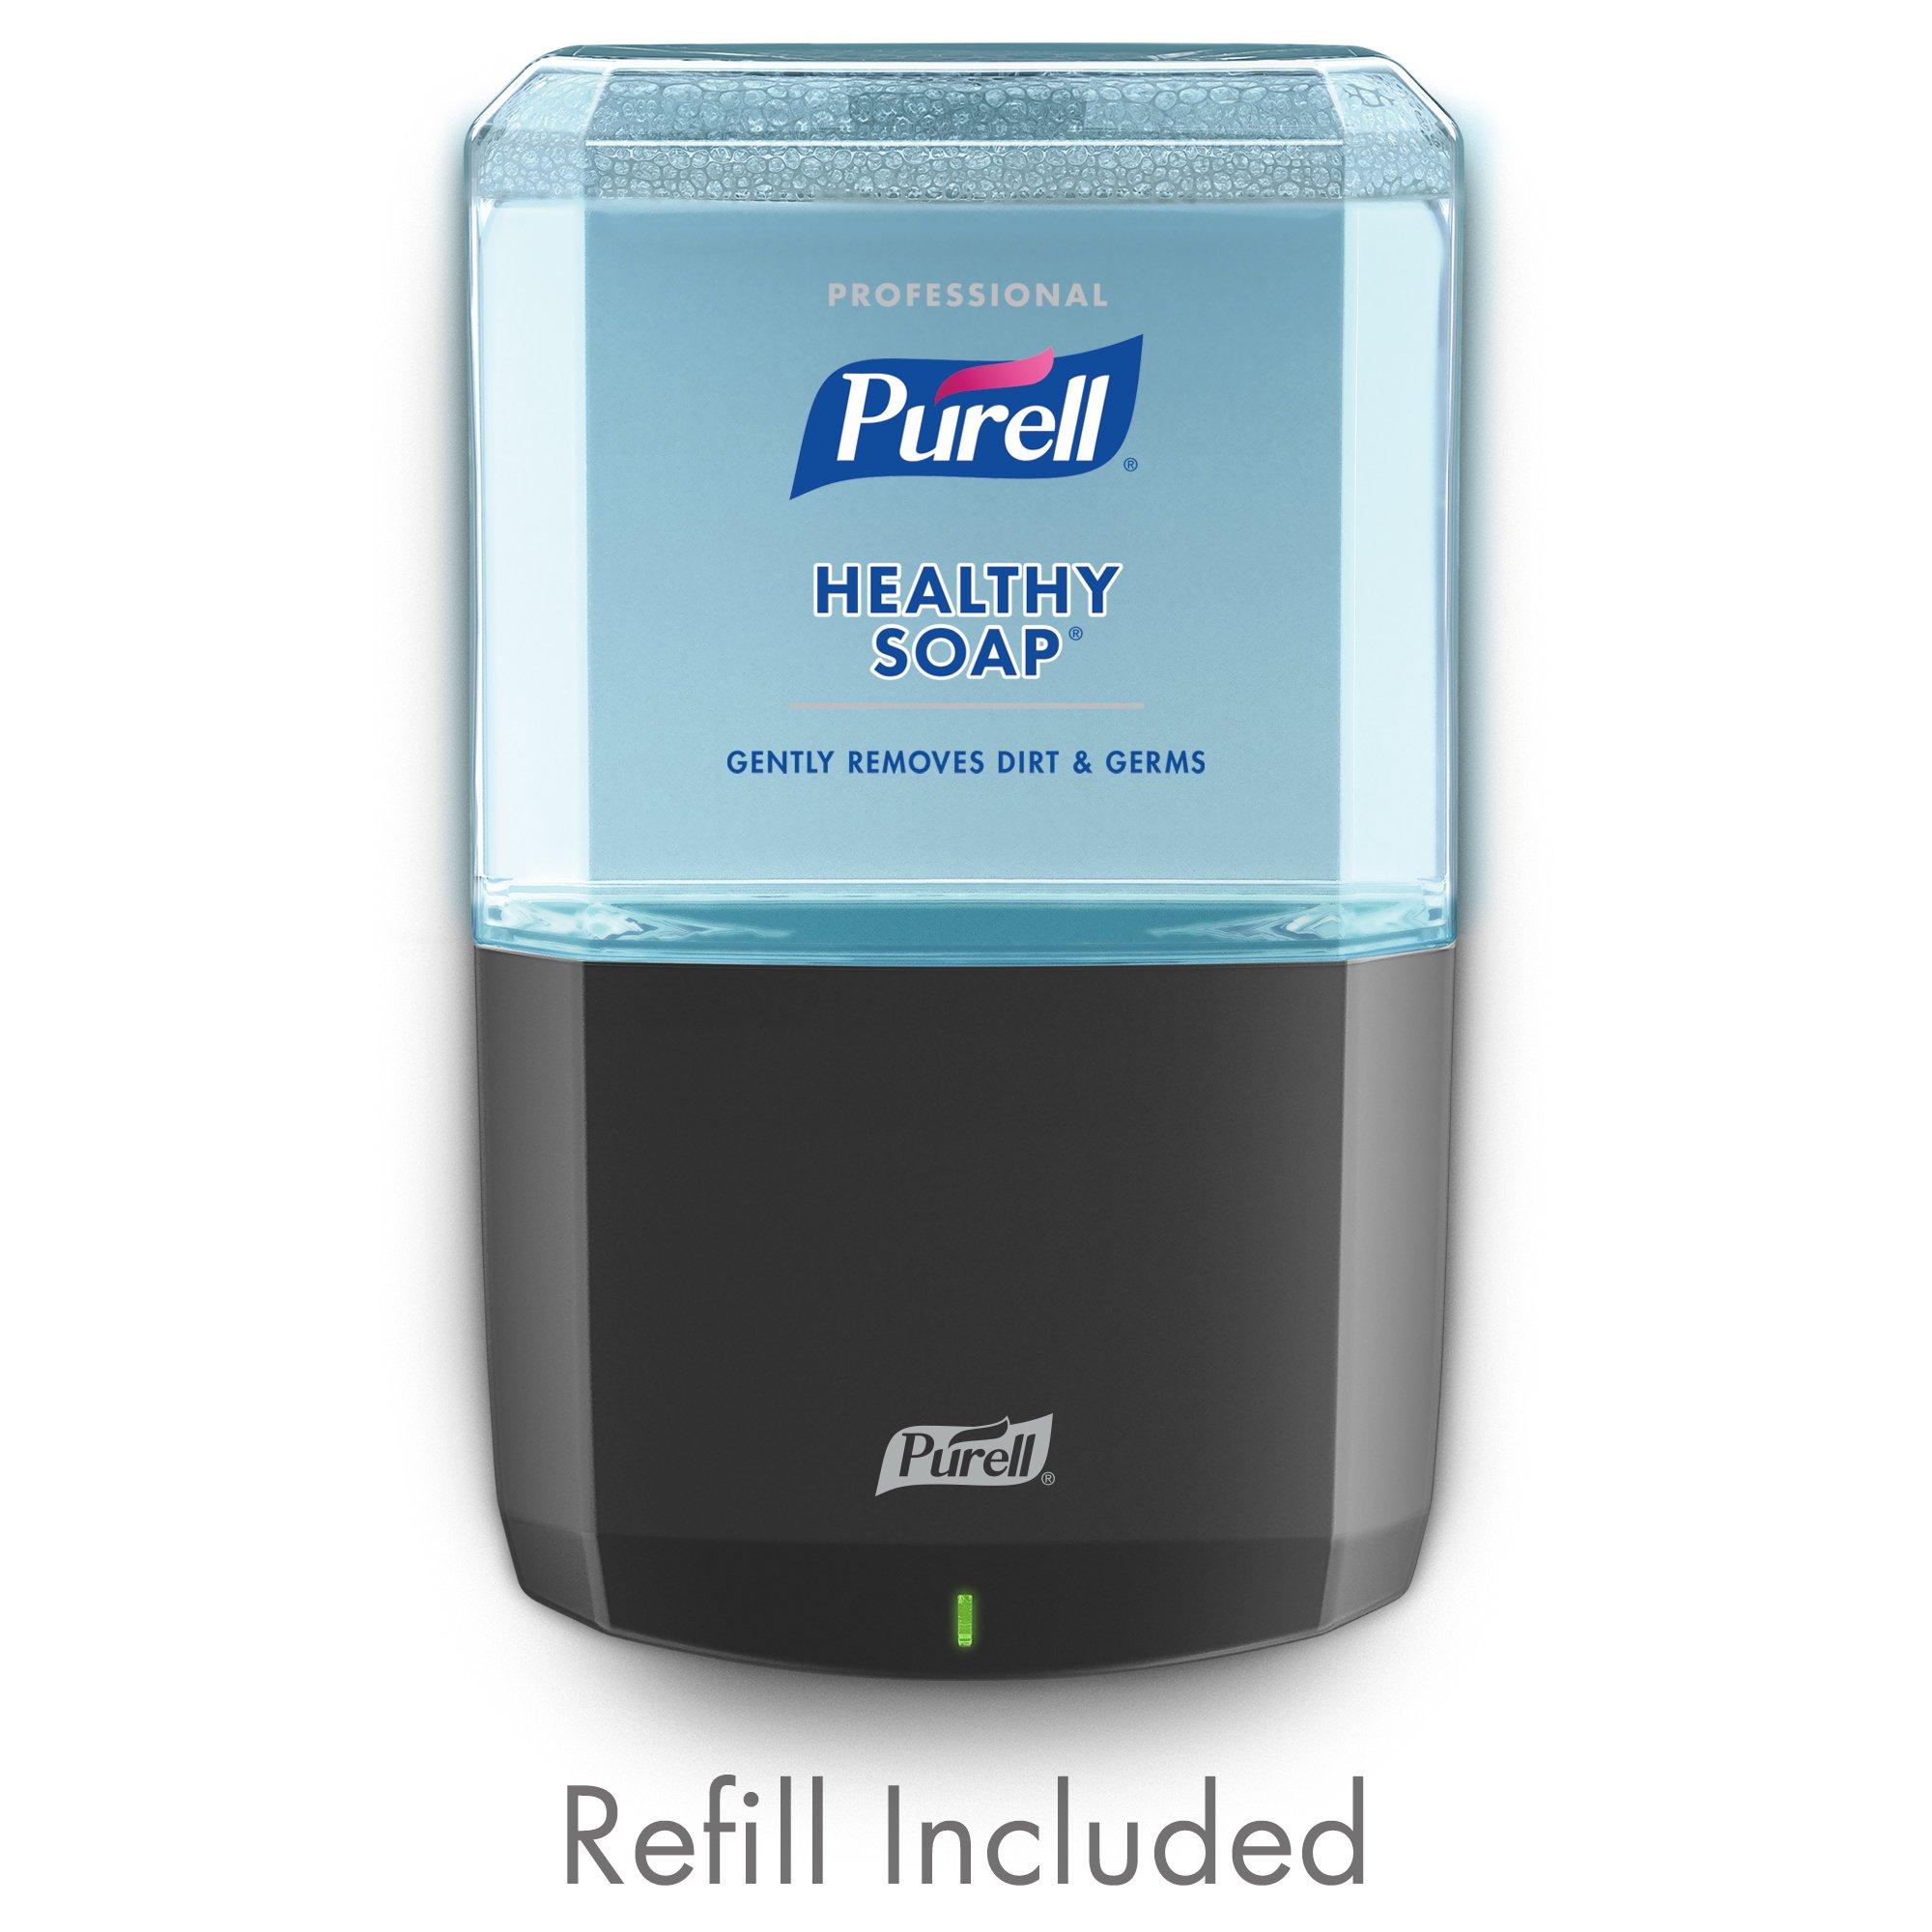 PURELL Professional HEALTHY SOAP Fresh Scent Foam ES6 Starter Kit, 1 - 1200 mL Soap Refill + 1 - ES6 Graphite Push Style Dispenser - 6477-1G